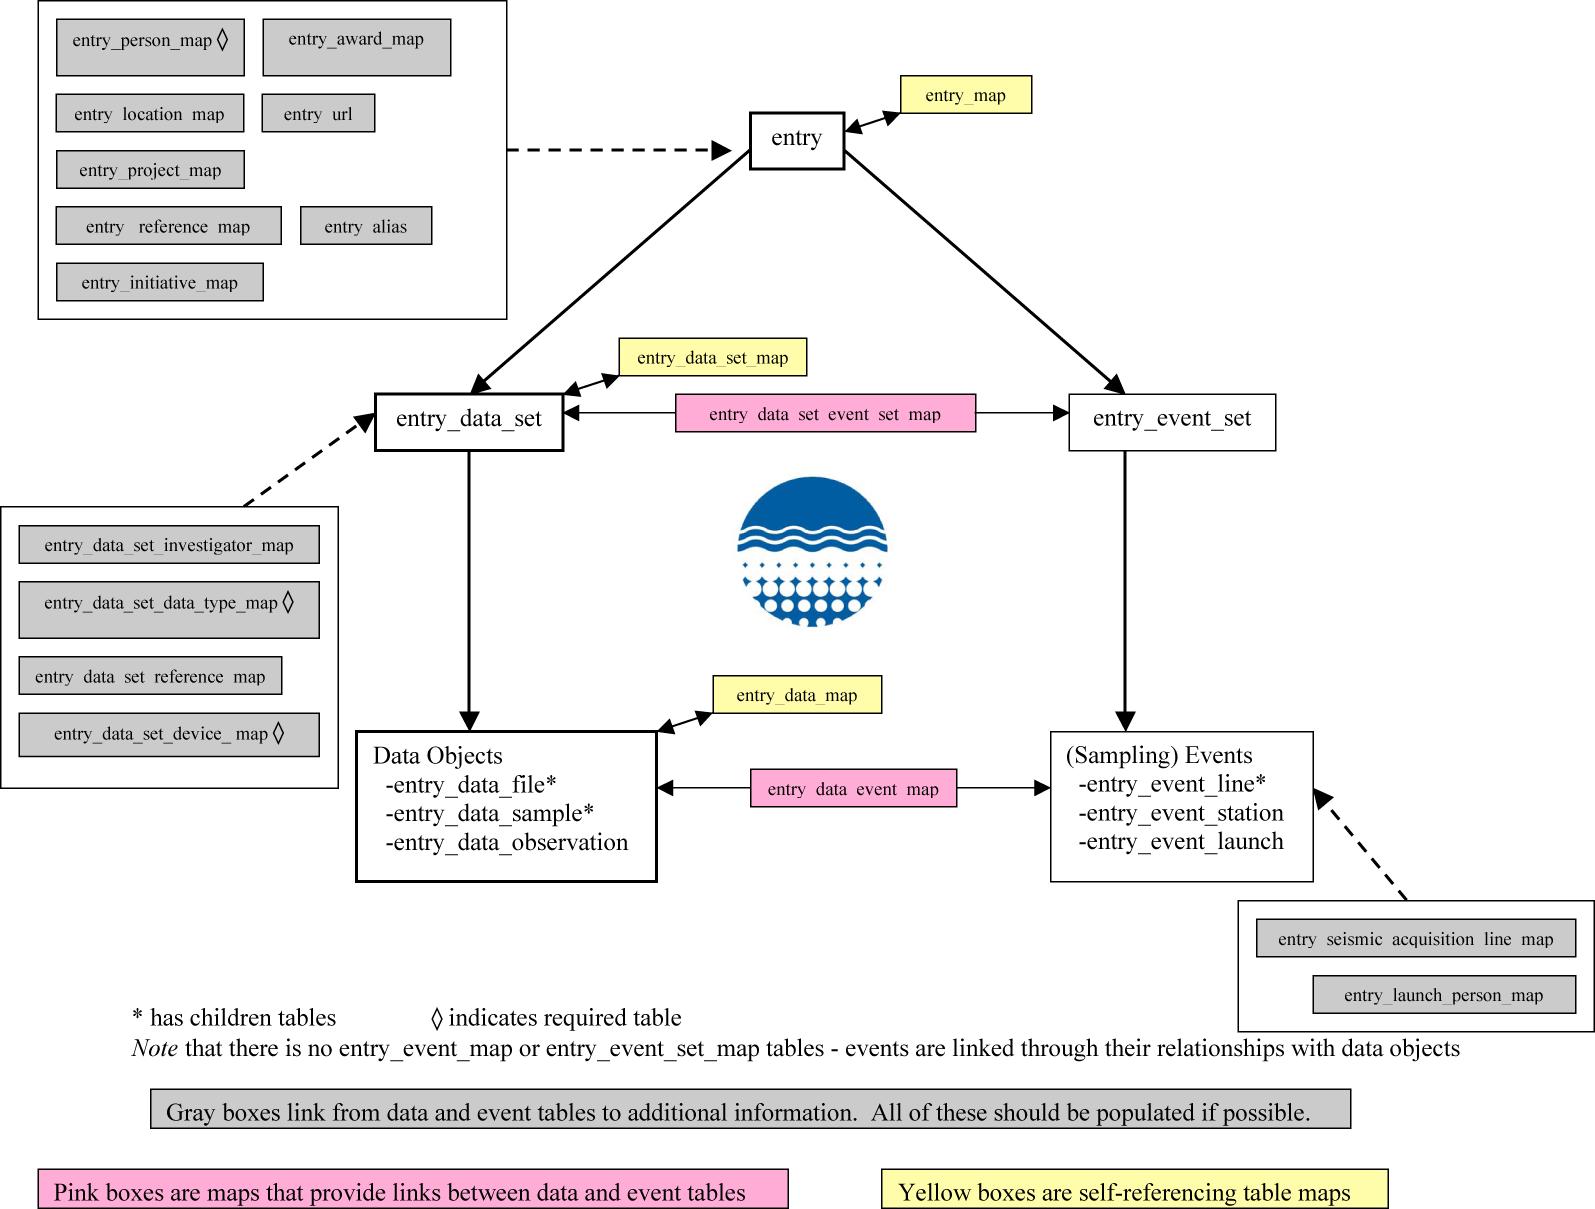 Marine Geoscience Data System: Data Model on